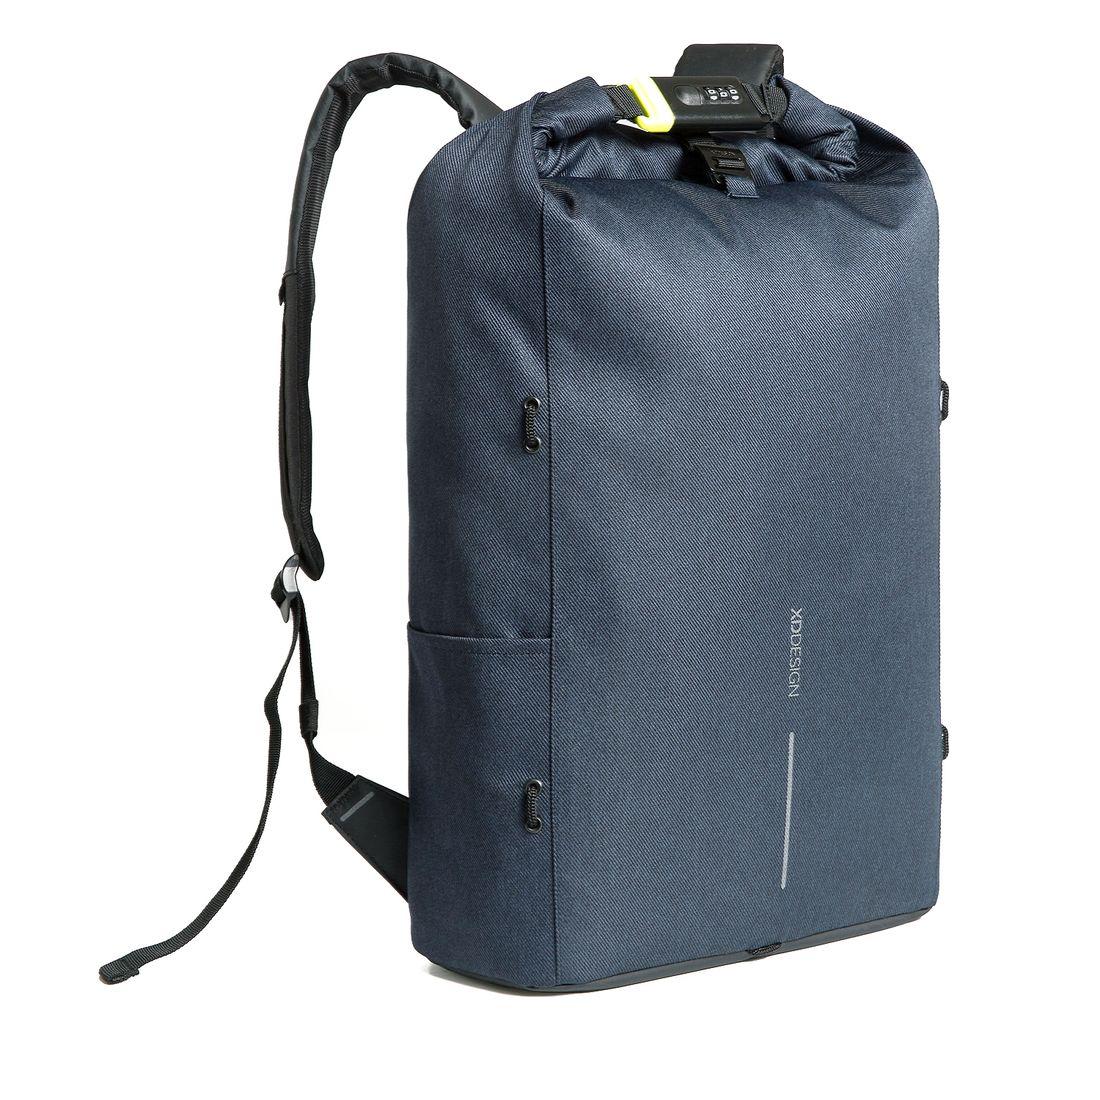 XD Design Bobby Urban Light Anti-theft Backpack Navy Blue-149451